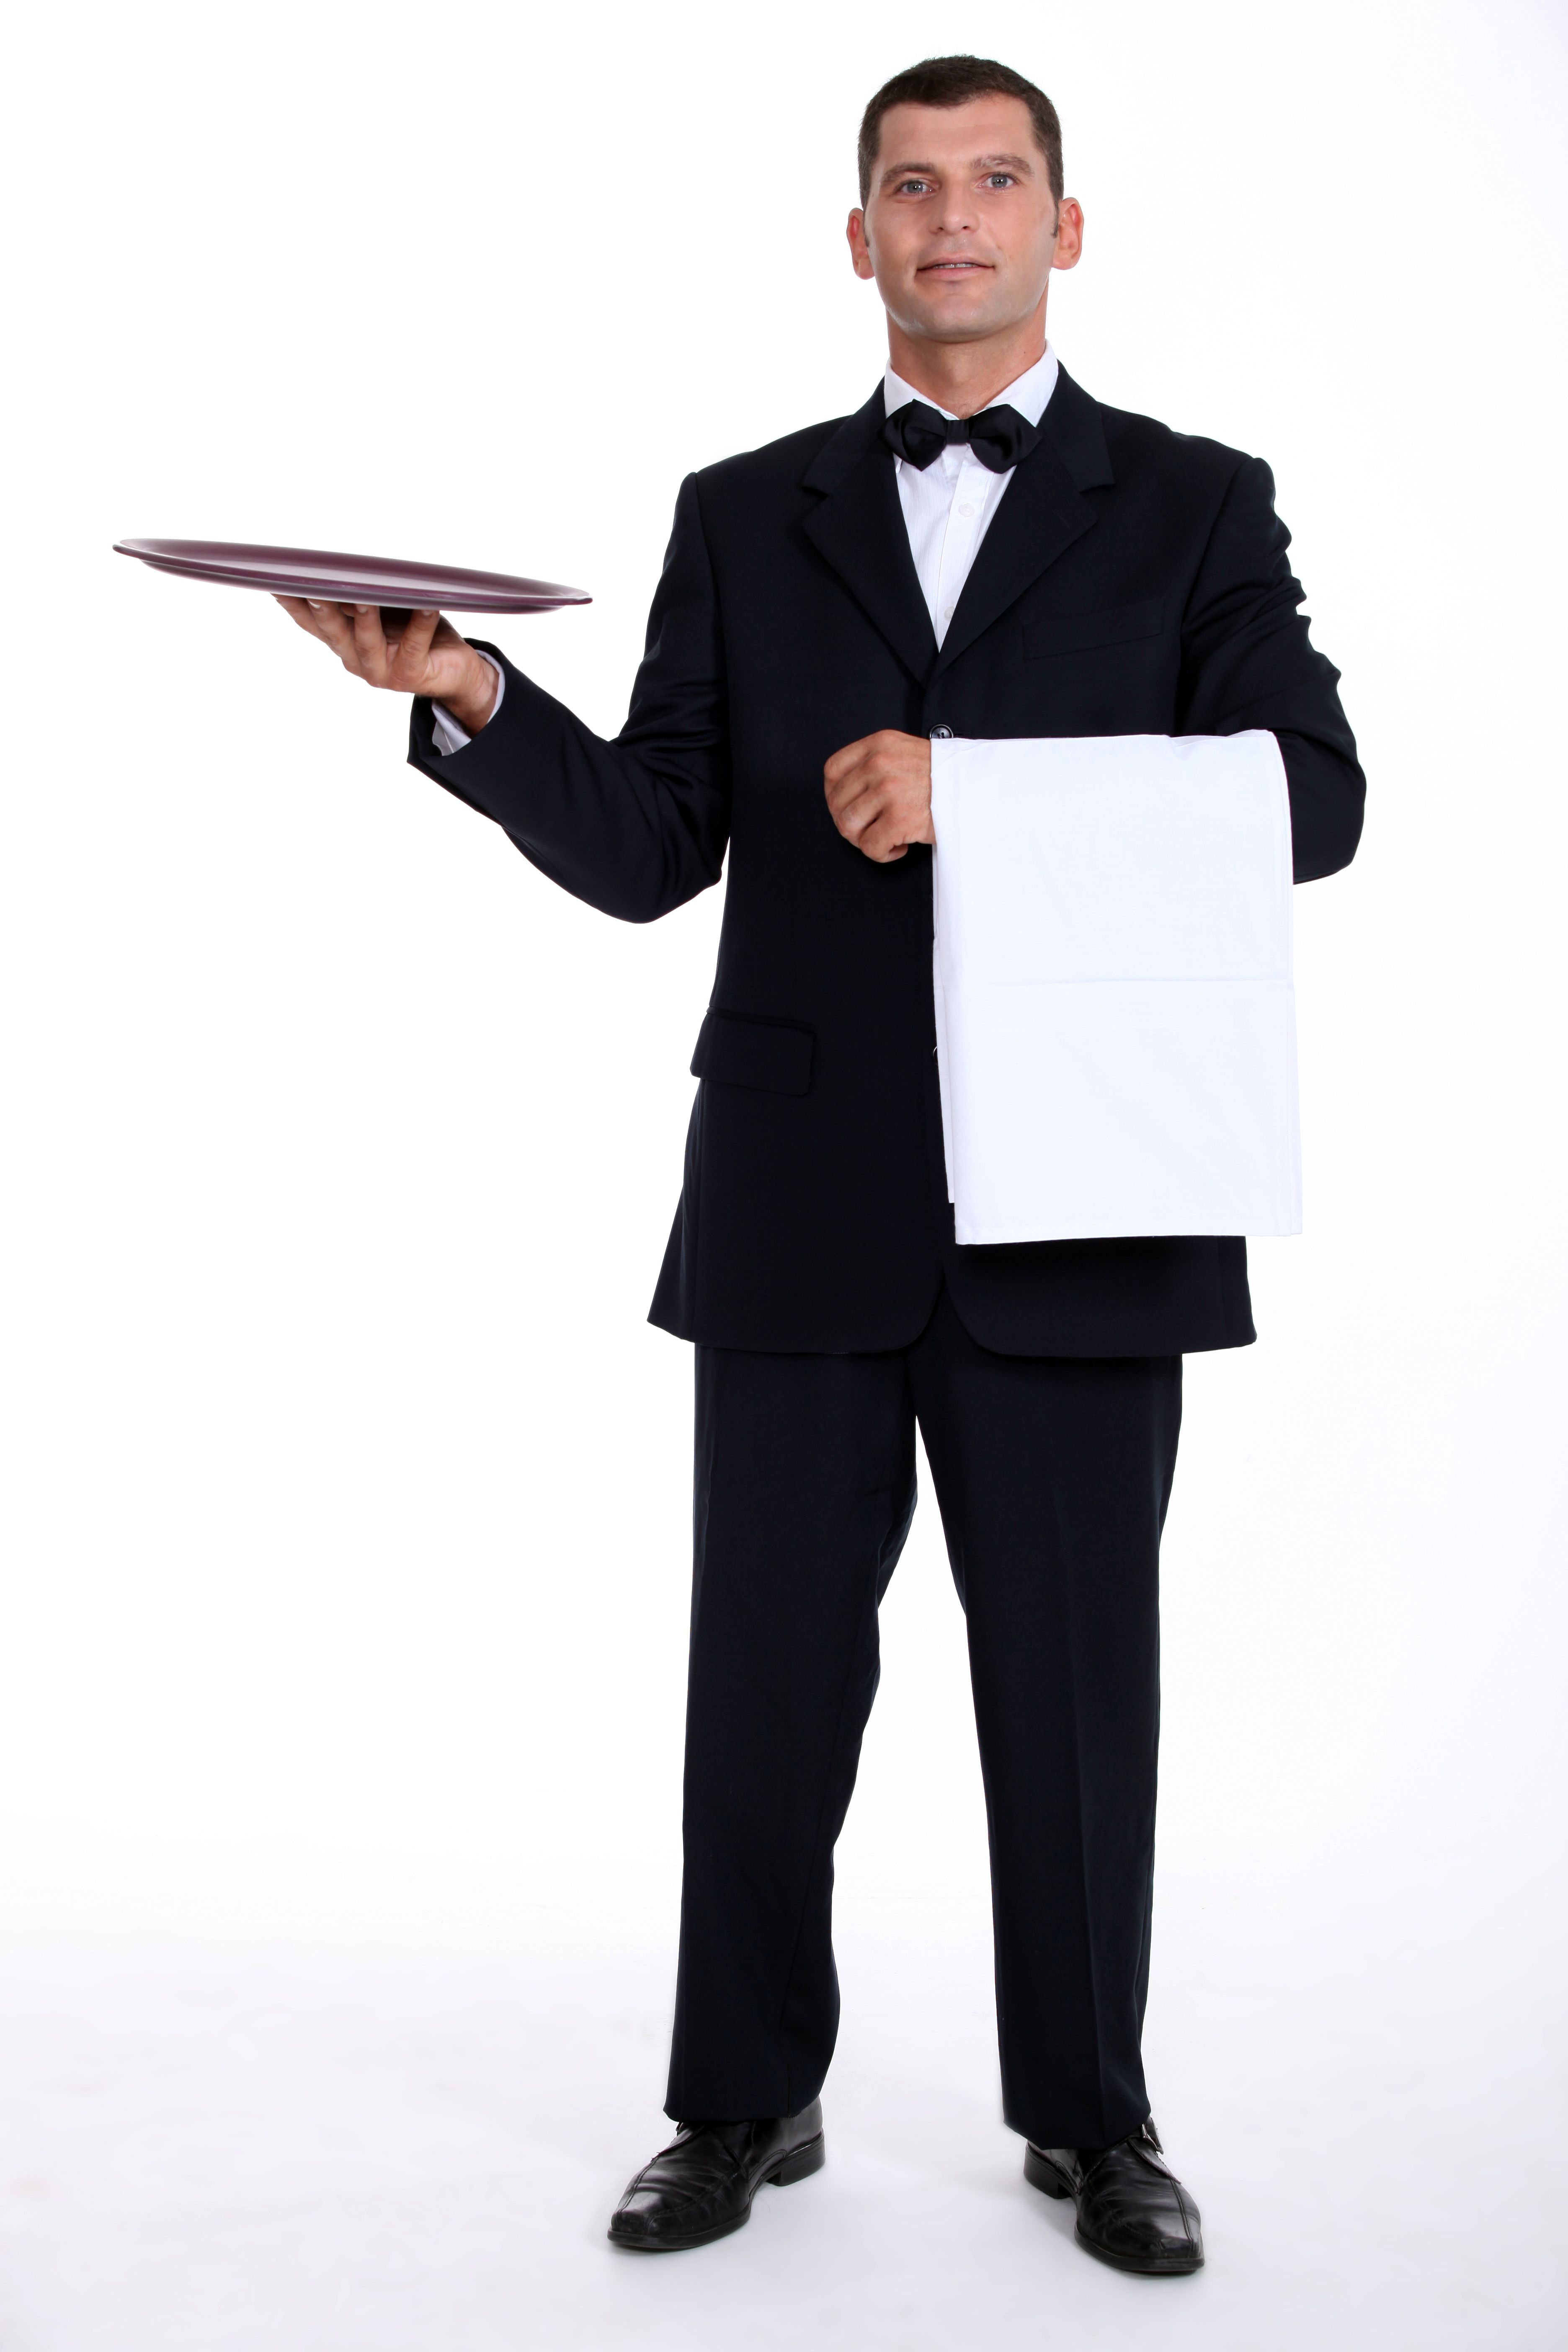 server tip proper attire training and education server tip proper attire